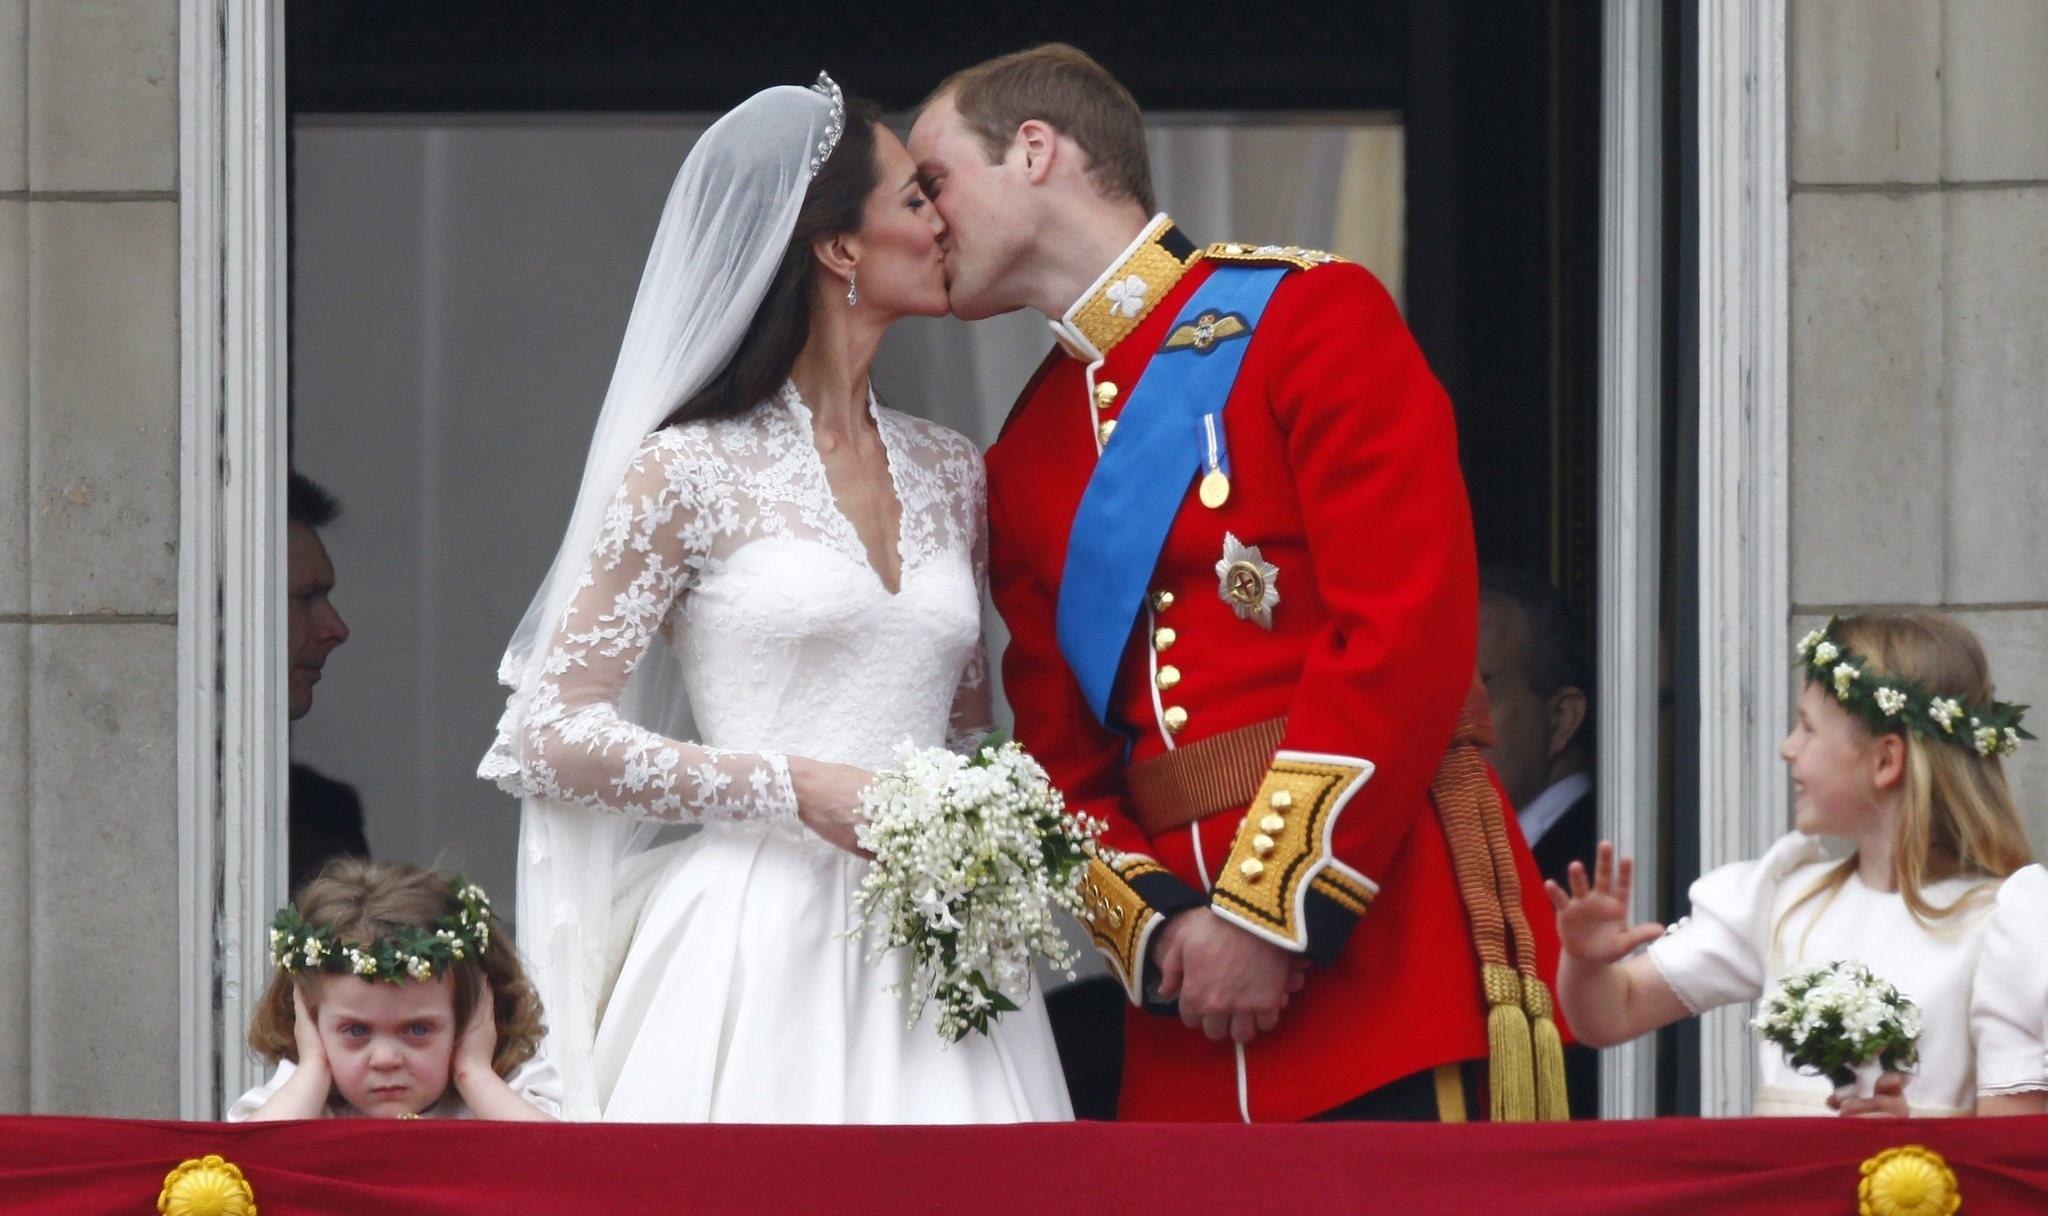 kate middleton s wedding dress from sarah burton of alexander mcqueen all the details nj com wedding dress from sarah burton